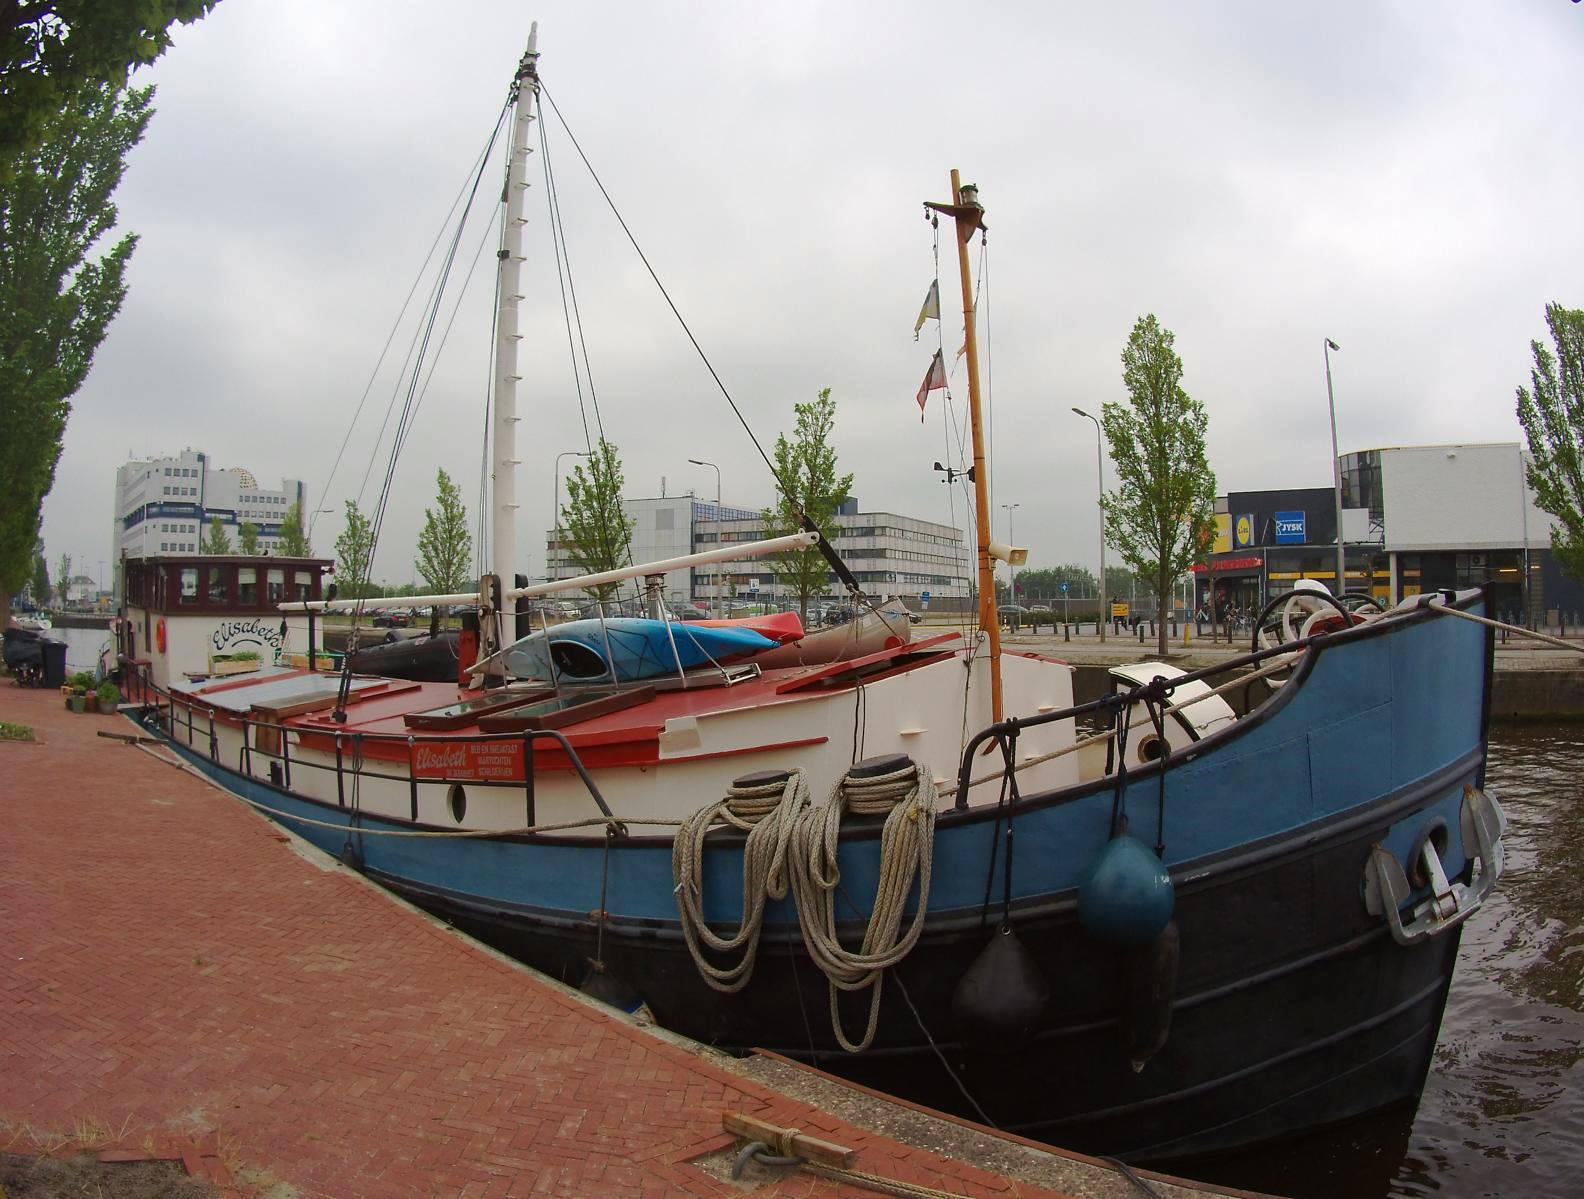 Hausbbot Leeuwarden, Friesland, Niederlande